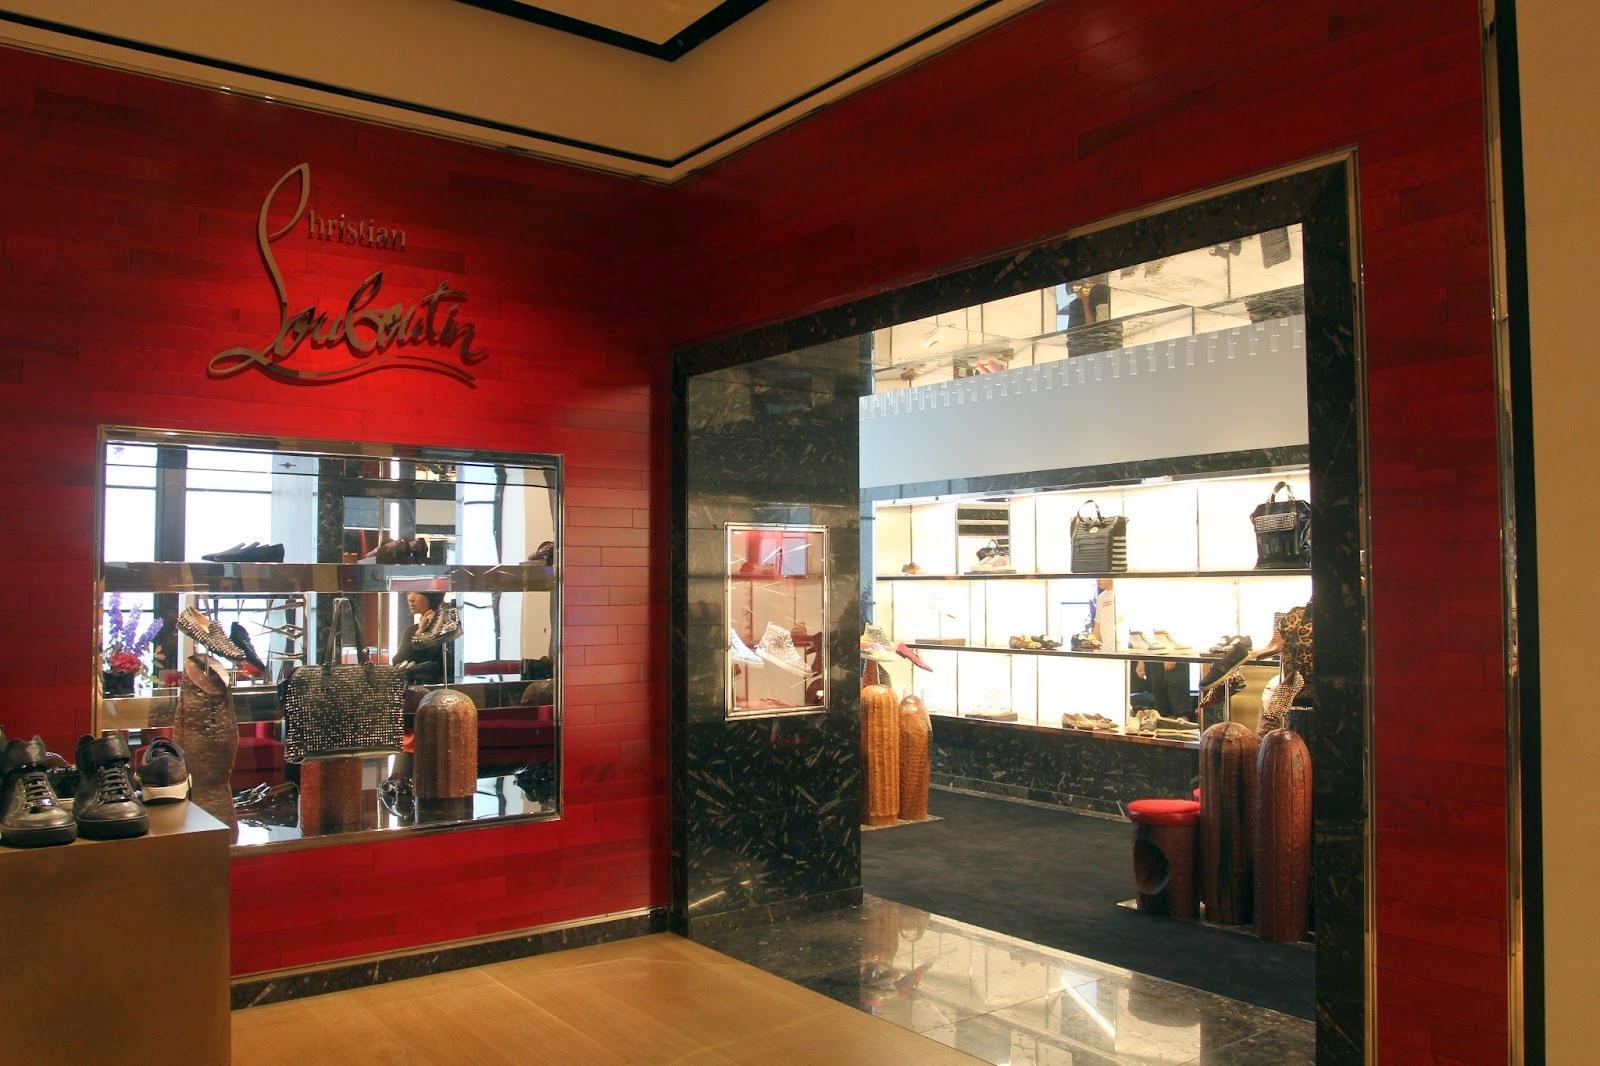 louis vuitton mens white loafers - Christian Louboutin opens men?????\u2039a\u20ac??\u201a?��???|?\u201a?a?\u2026?? boutique at Selfridges London (1).jpg